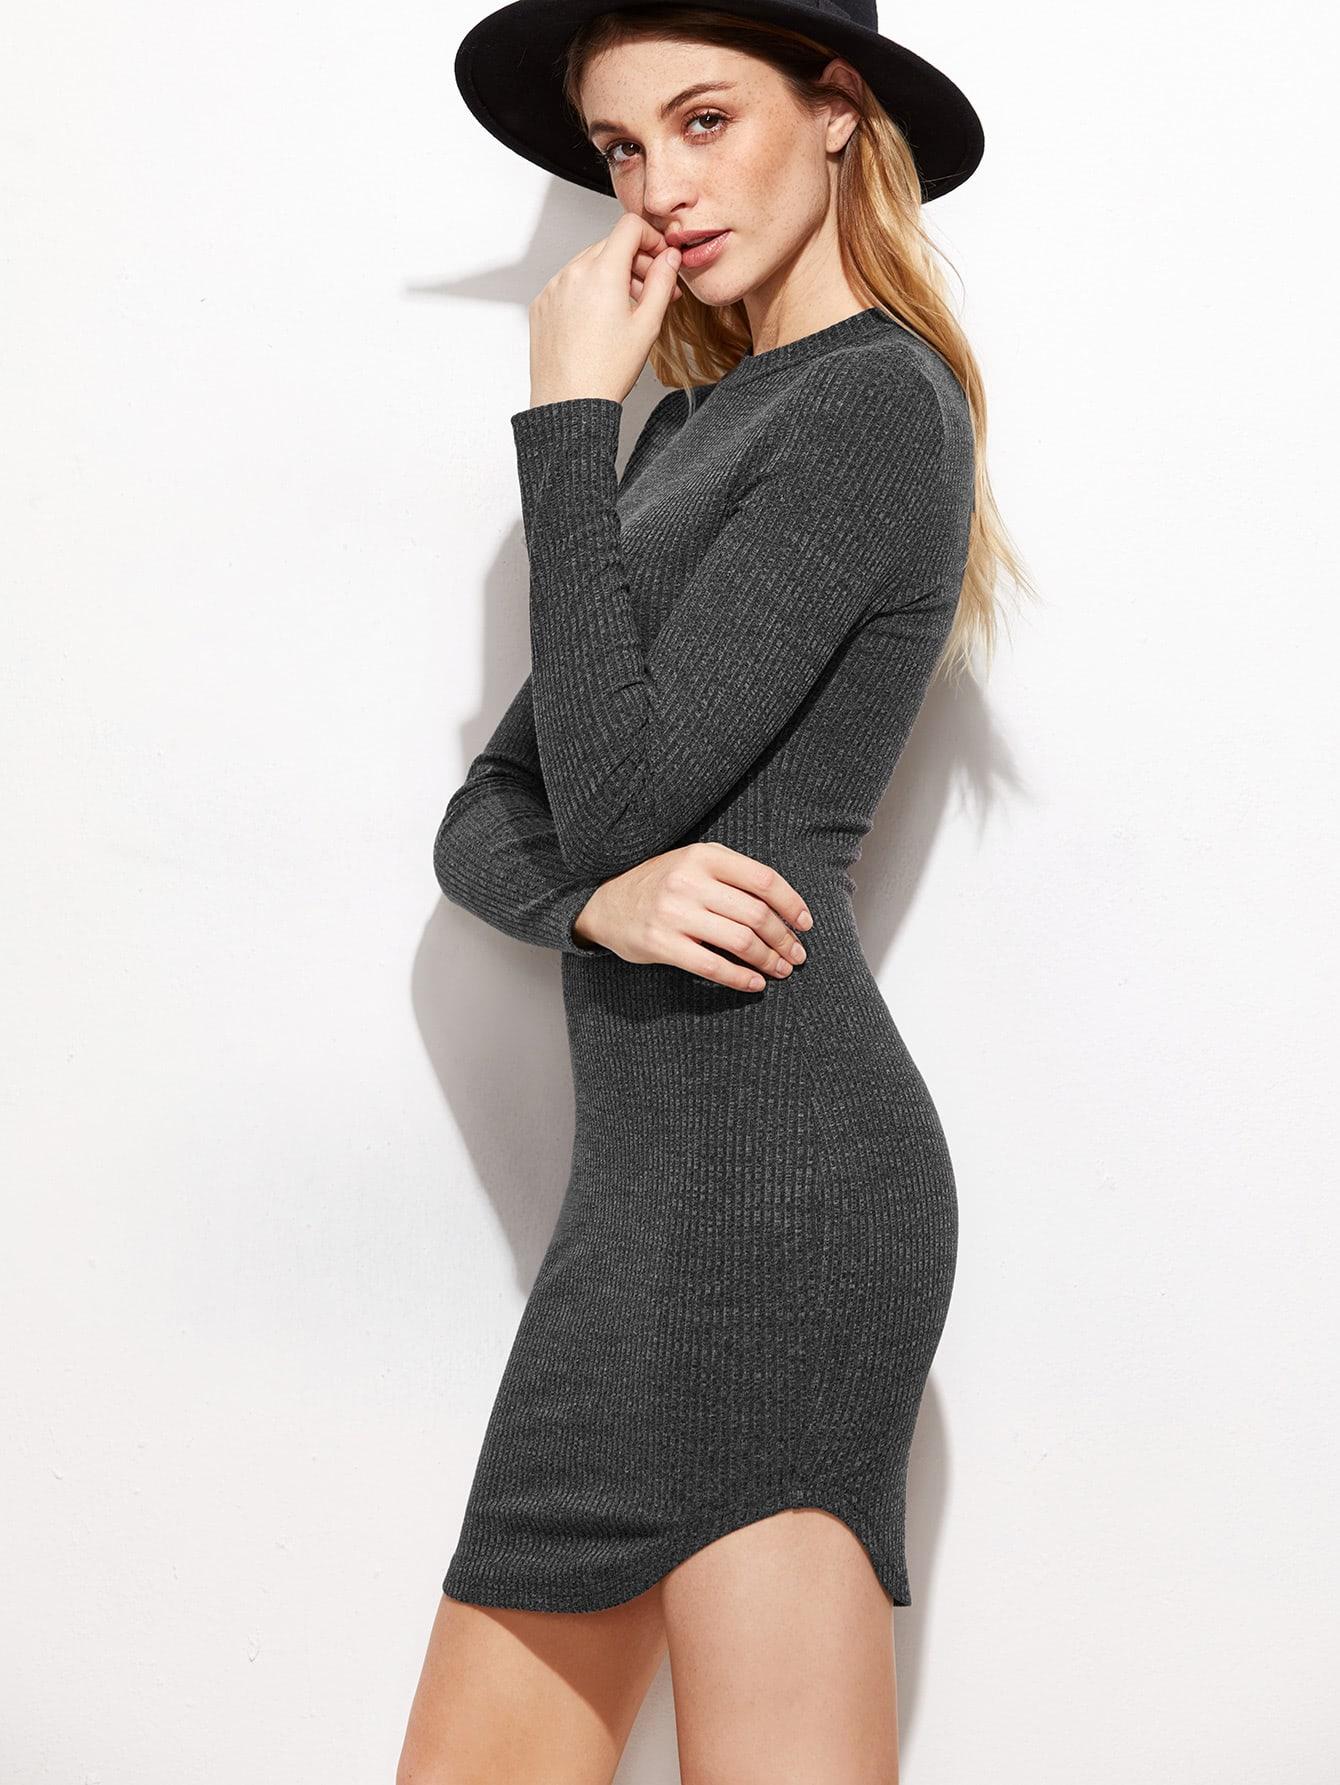 Heather Grey Ribbed Knit Curved Hem Bodycon Dress dress161028703